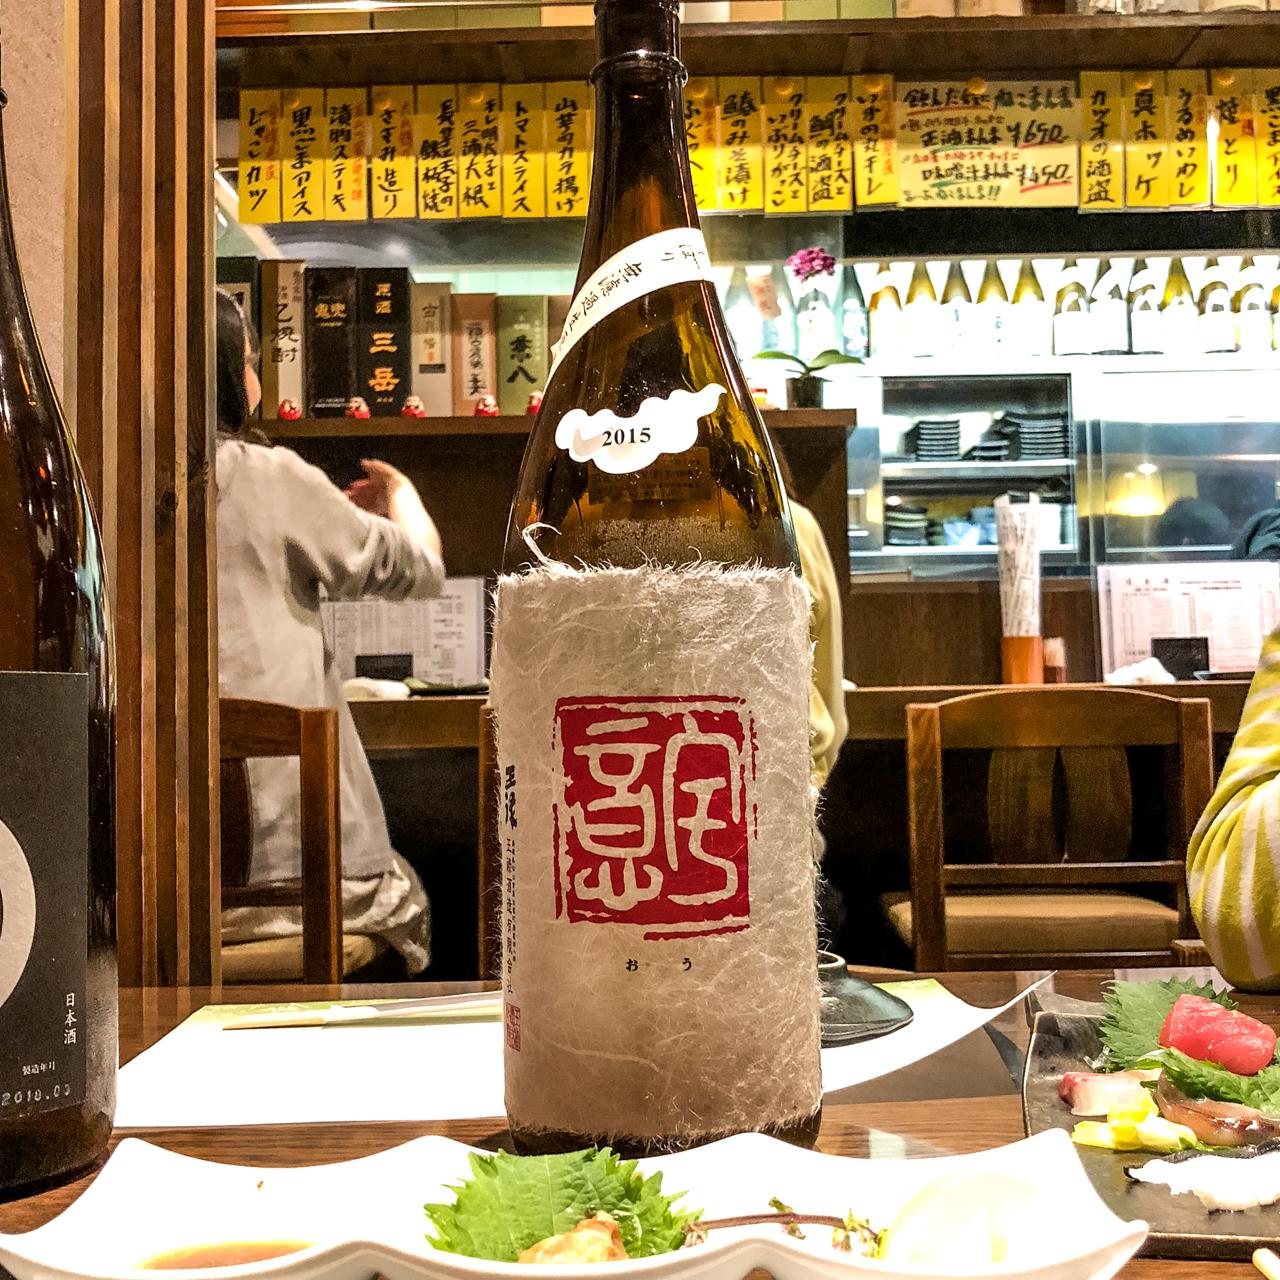 osaka japan 24 - Sake, Sashimi und Ramen